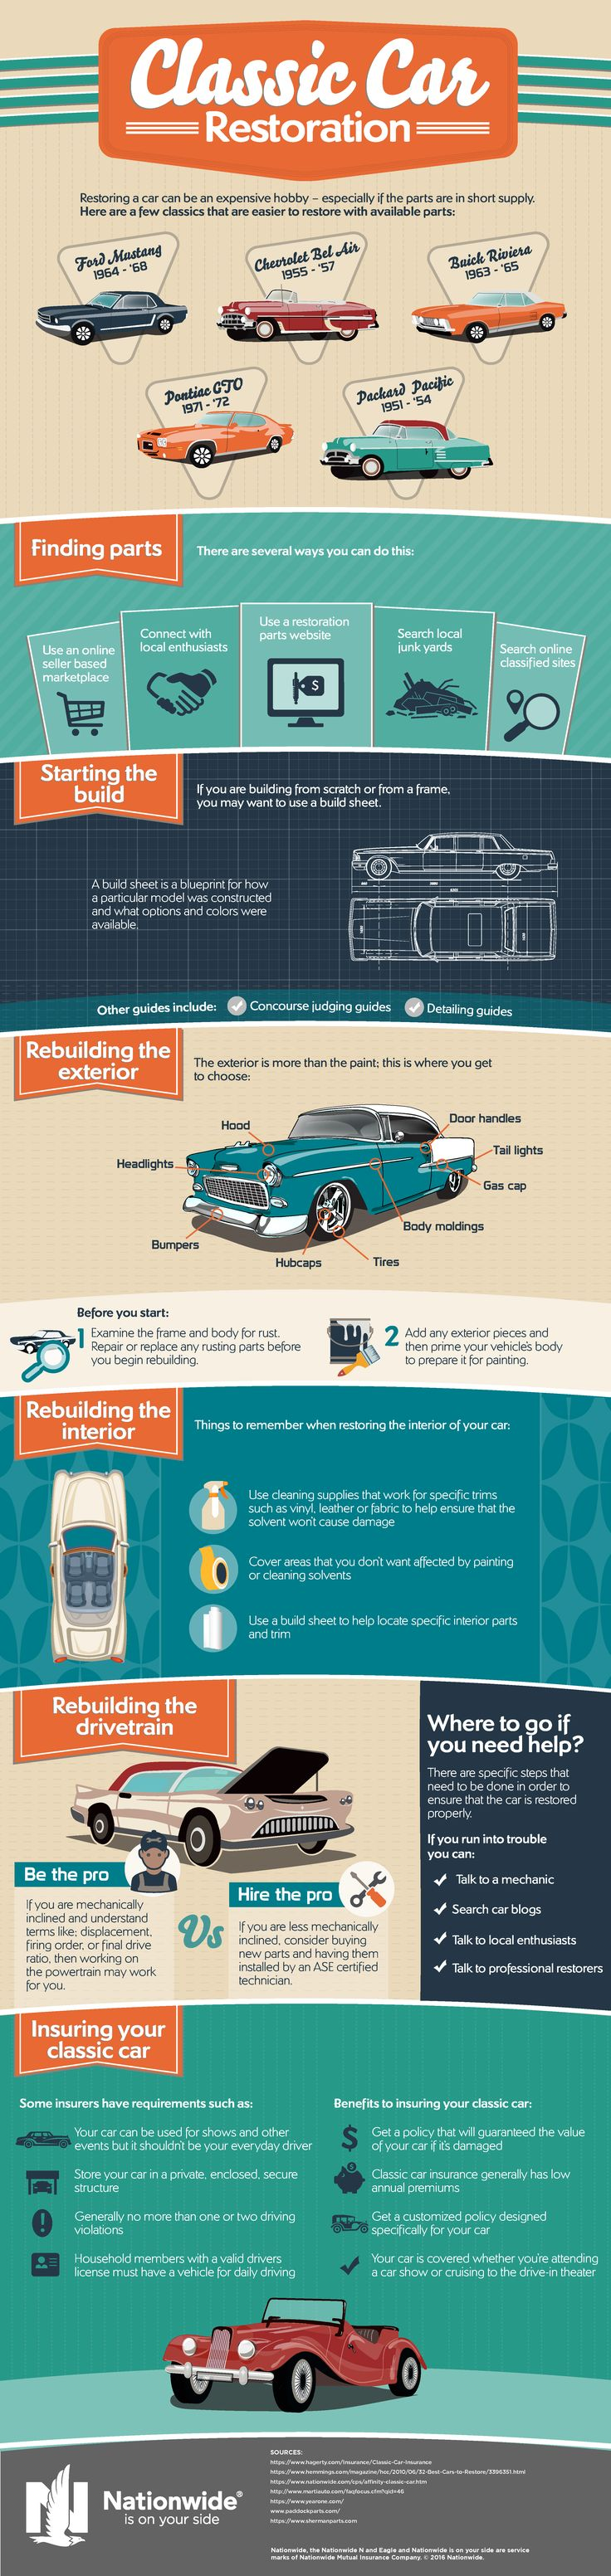 1956 chevrolet belair mjc classic cars pristine - Classic Car Restoration How To Restore A Classic Car